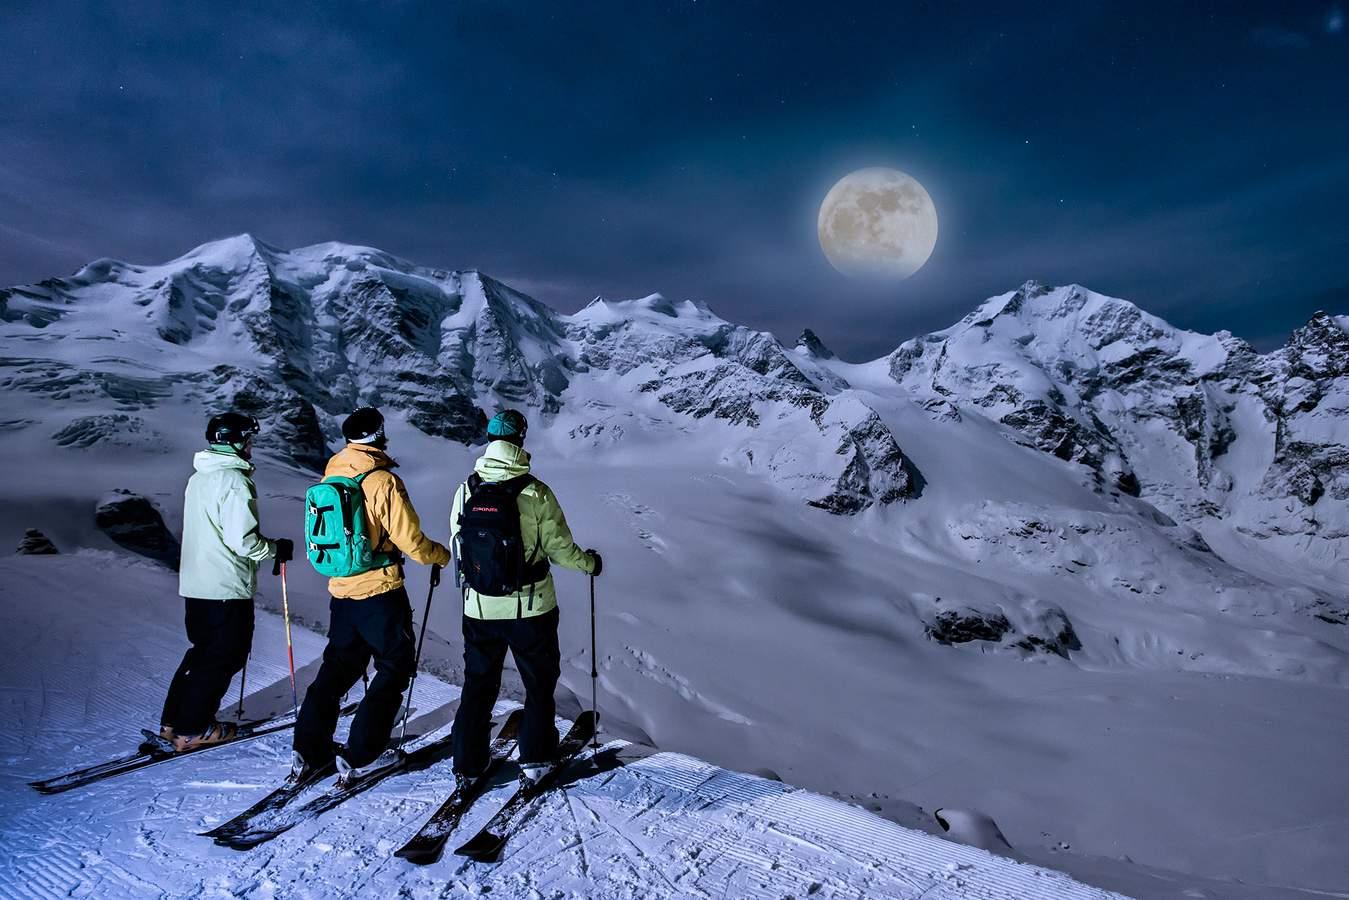 Skiing snowboarding in pontresina the engadine - Ski wallpaper ...